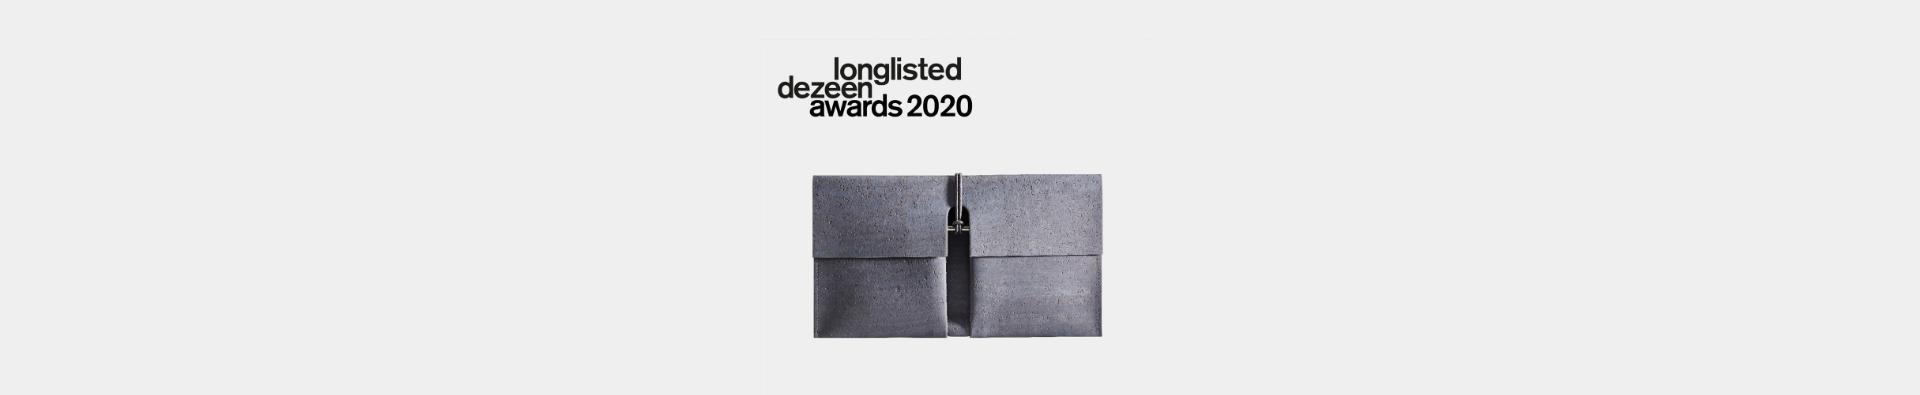 burggrafburggraf-longlist-dezeen-awards-2020